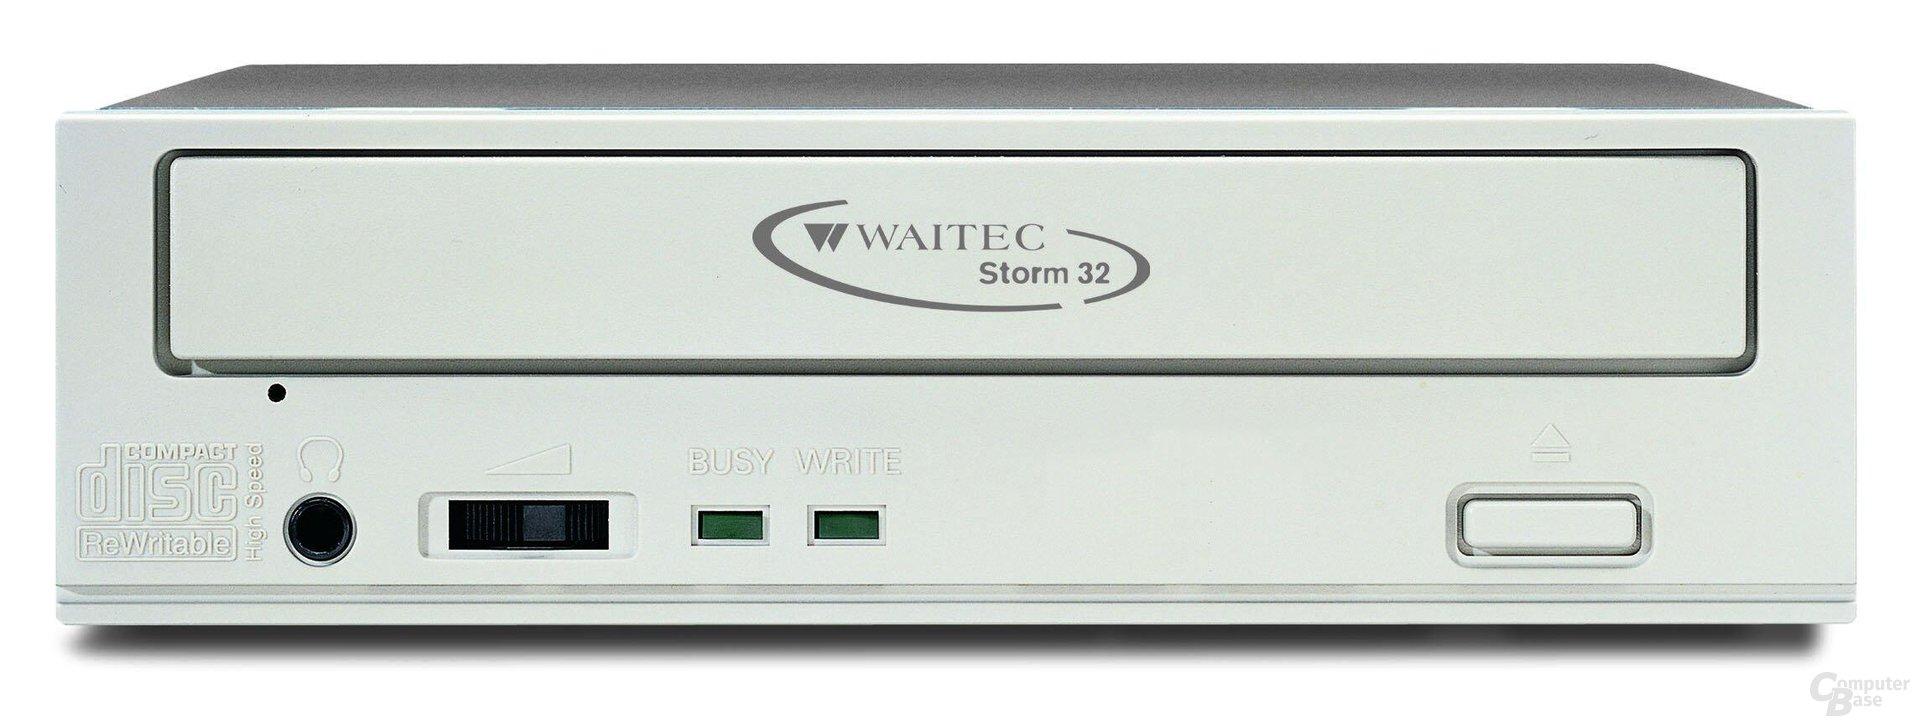 Waitec Storm32